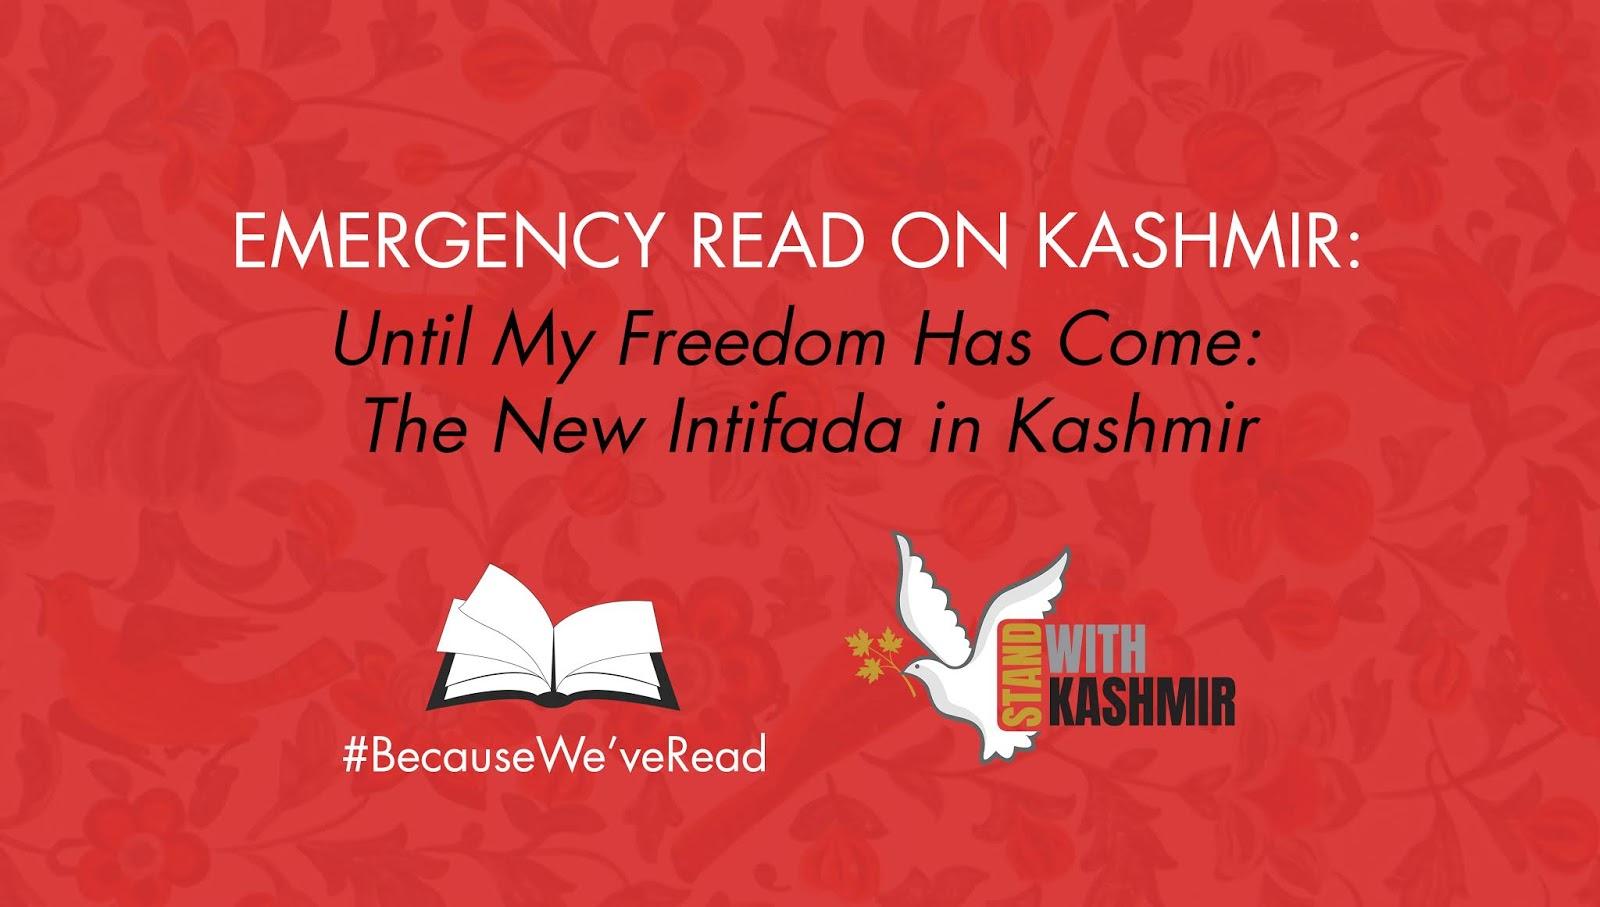 EMERGENCY READ ON KASHMIR: UNTIL MY FREEDOM HAS COME